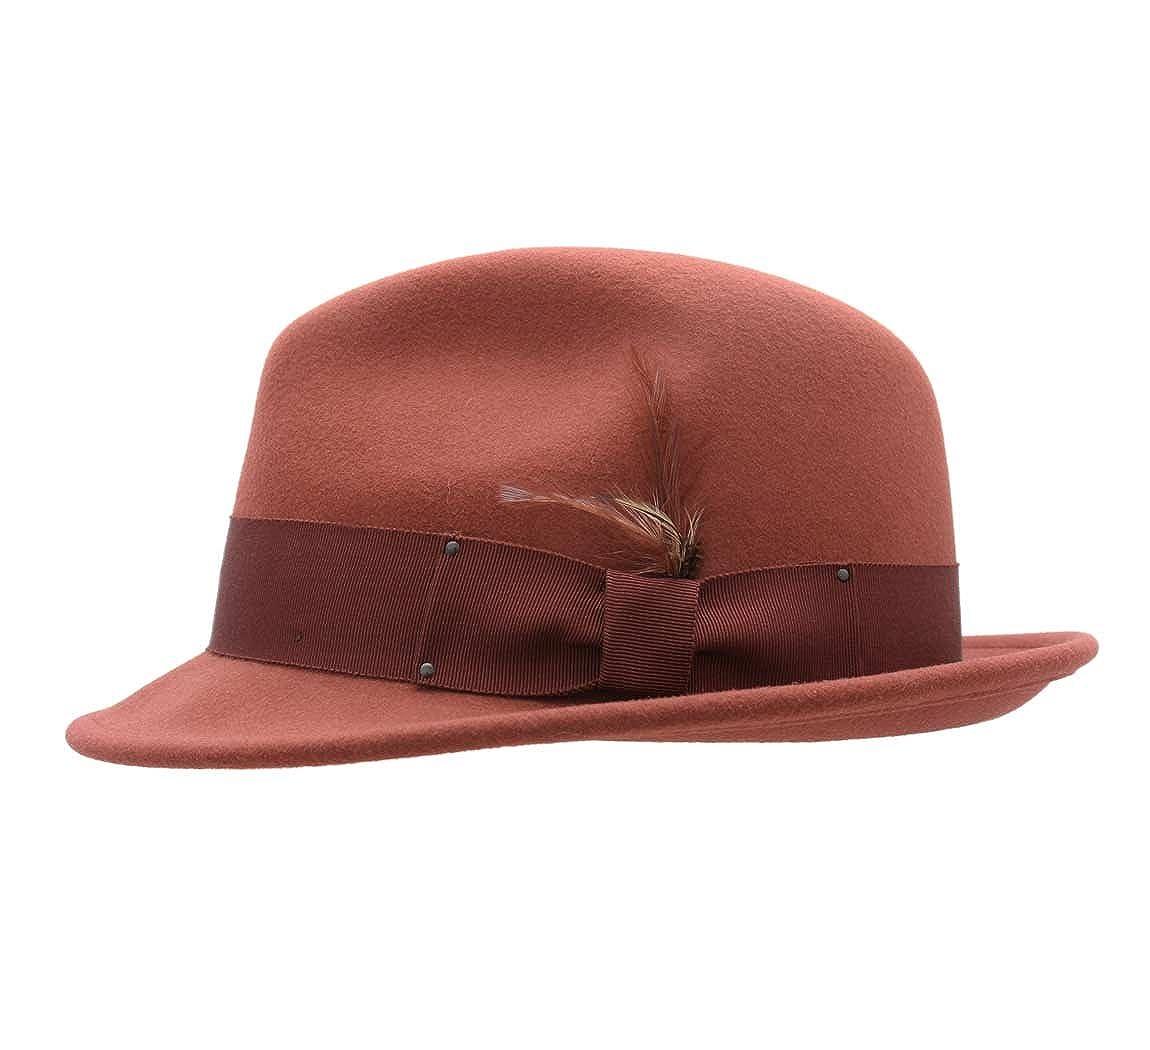 Bailey of Hollywood Tino Wool Felt Trilby Hat